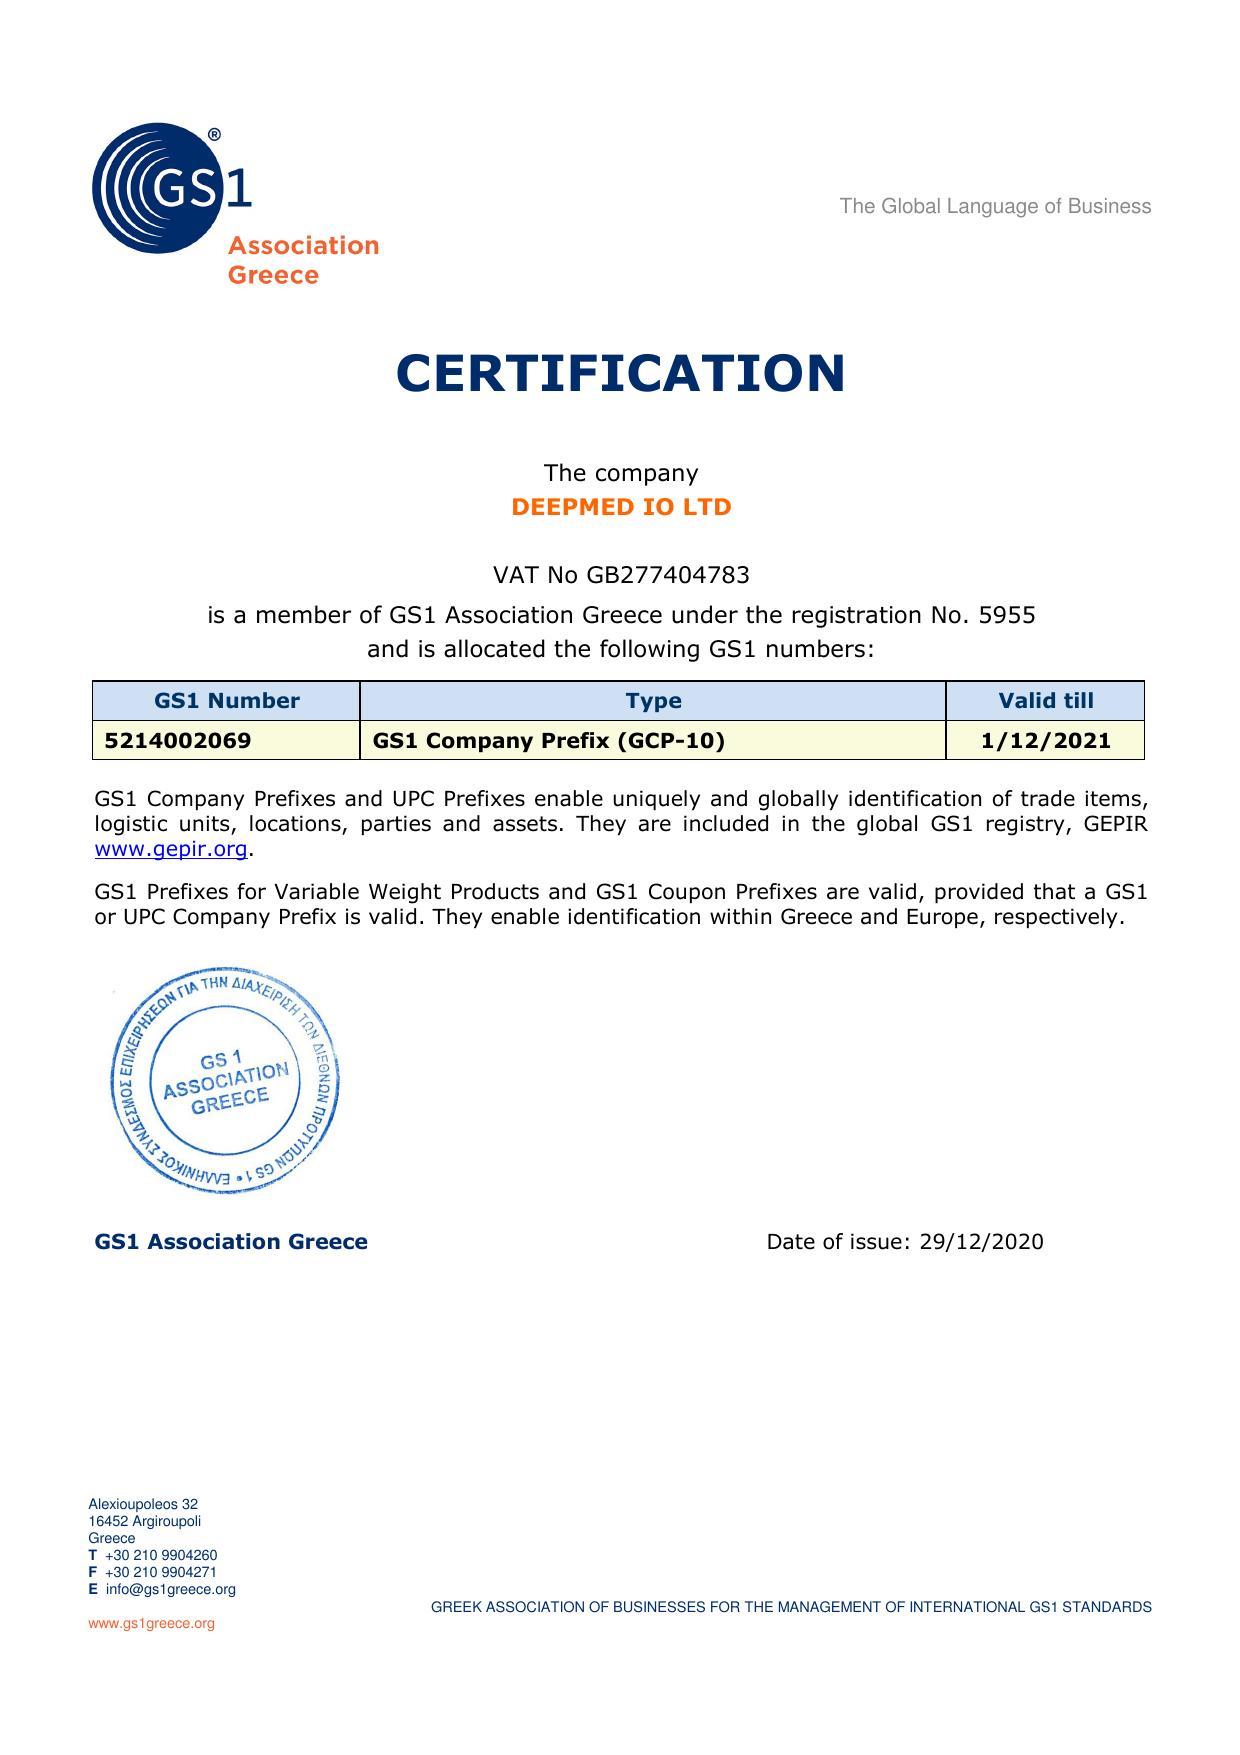 GS1 Certification